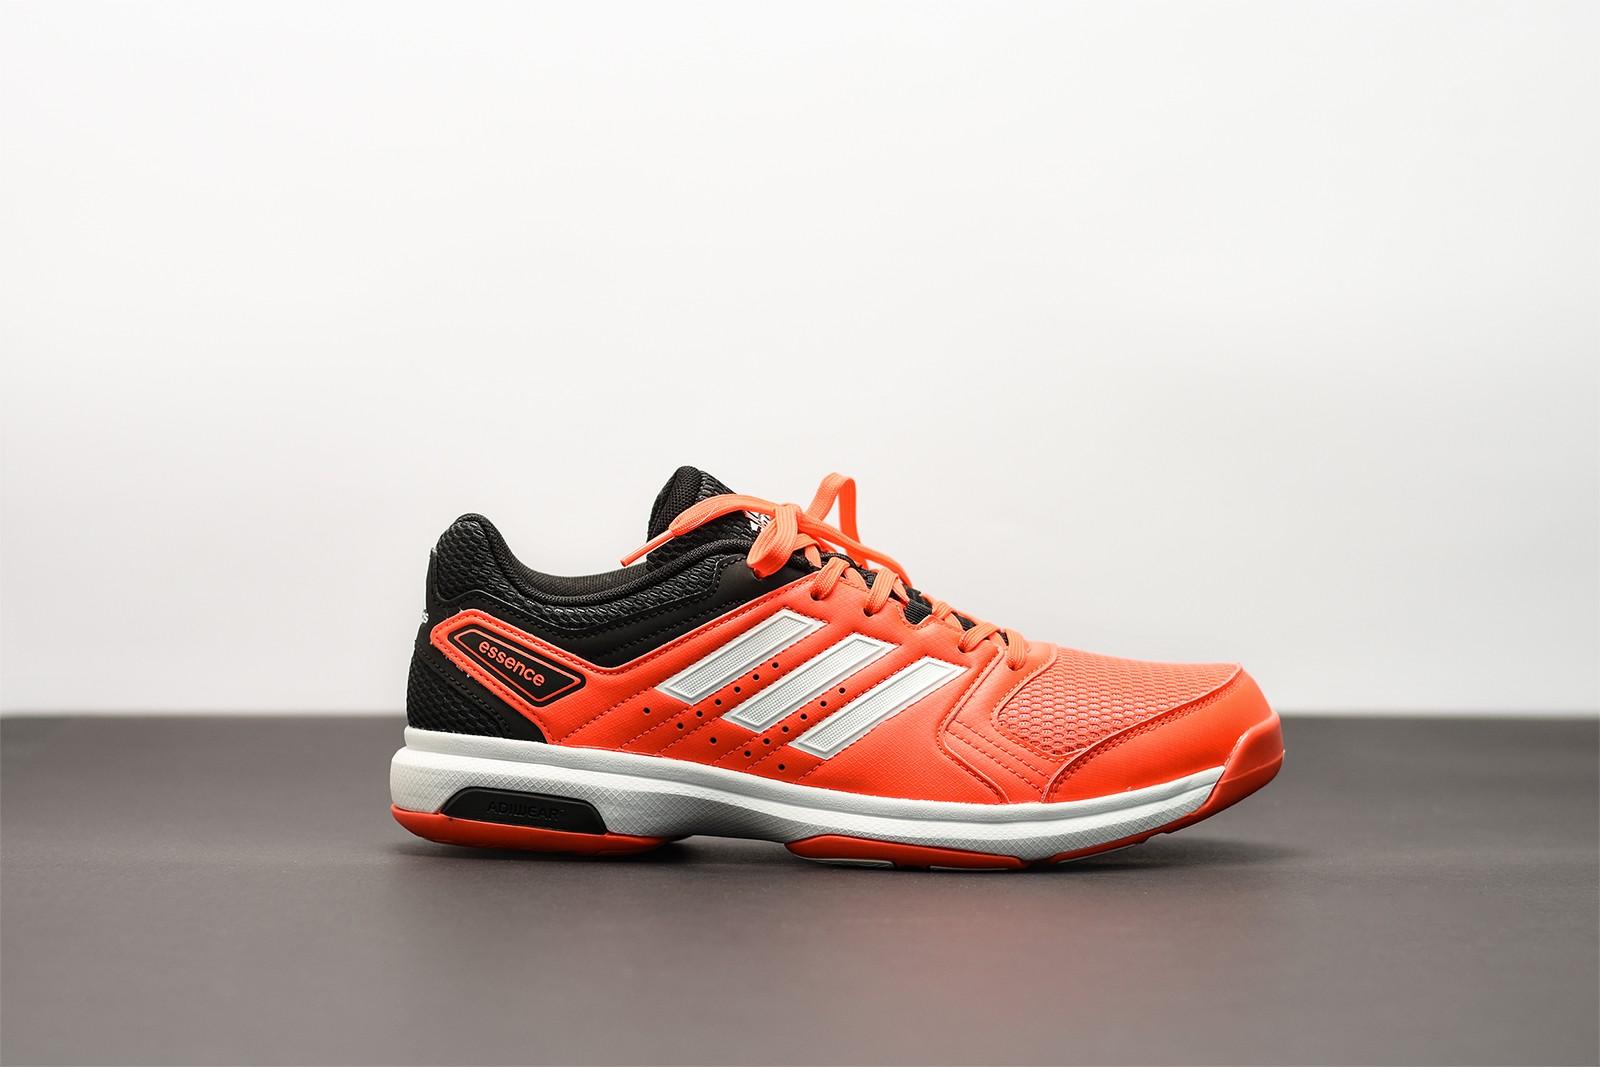 9f4760e5ac8 Pánské sálové boty adidas Performance ESSENCE